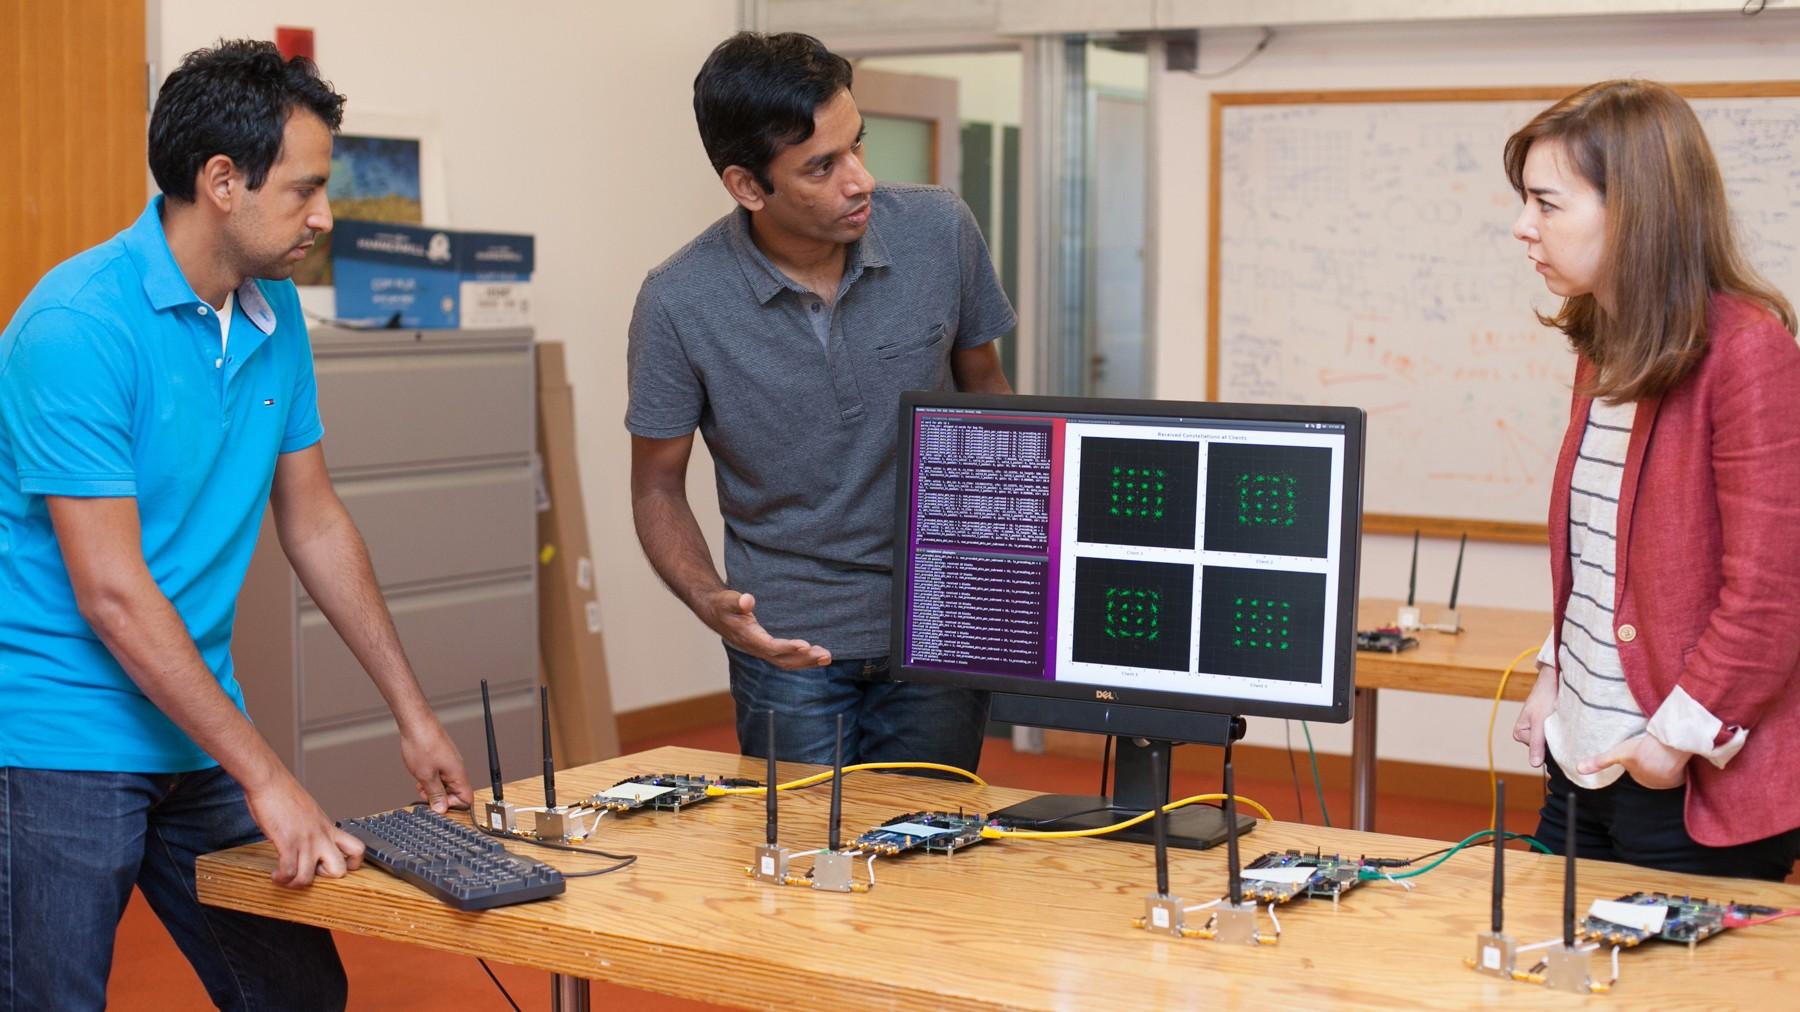 Tecnologia do MIT promete resolver o problema das redes Wi-Fi congestionadas -